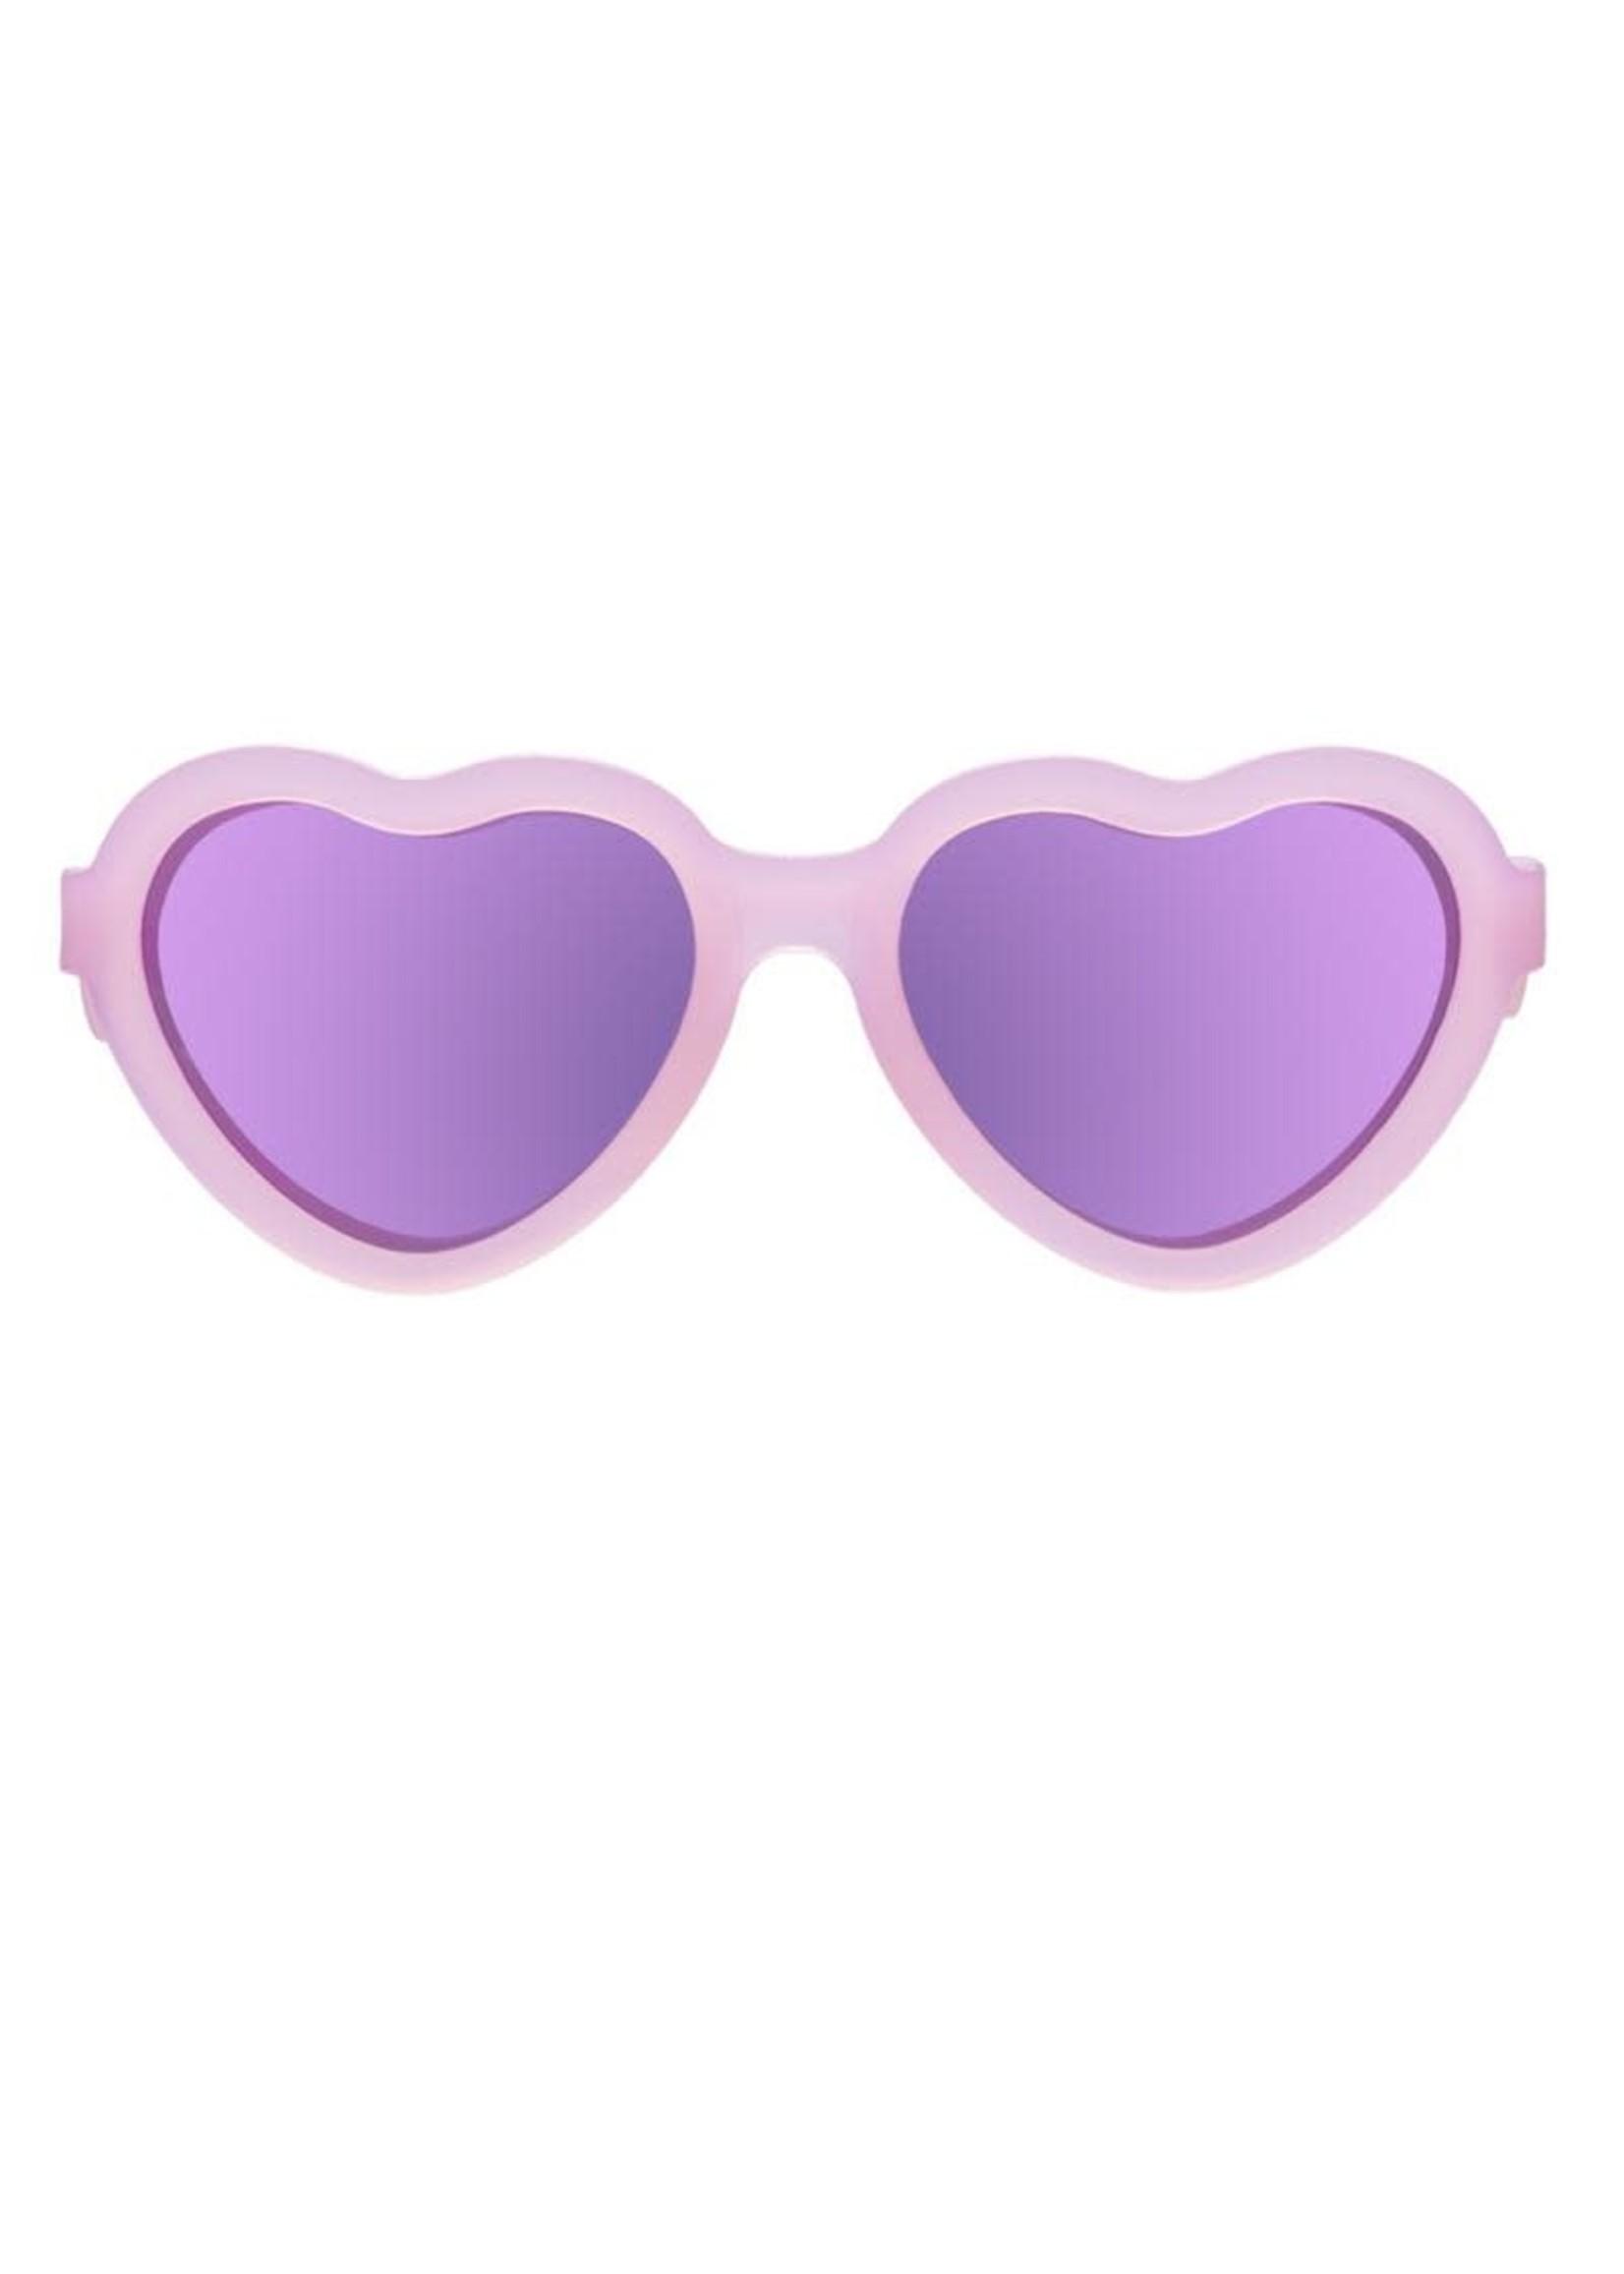 Babiators Babiators, The Influencer, Heart Polarized Sunglasses in Pink Transparent